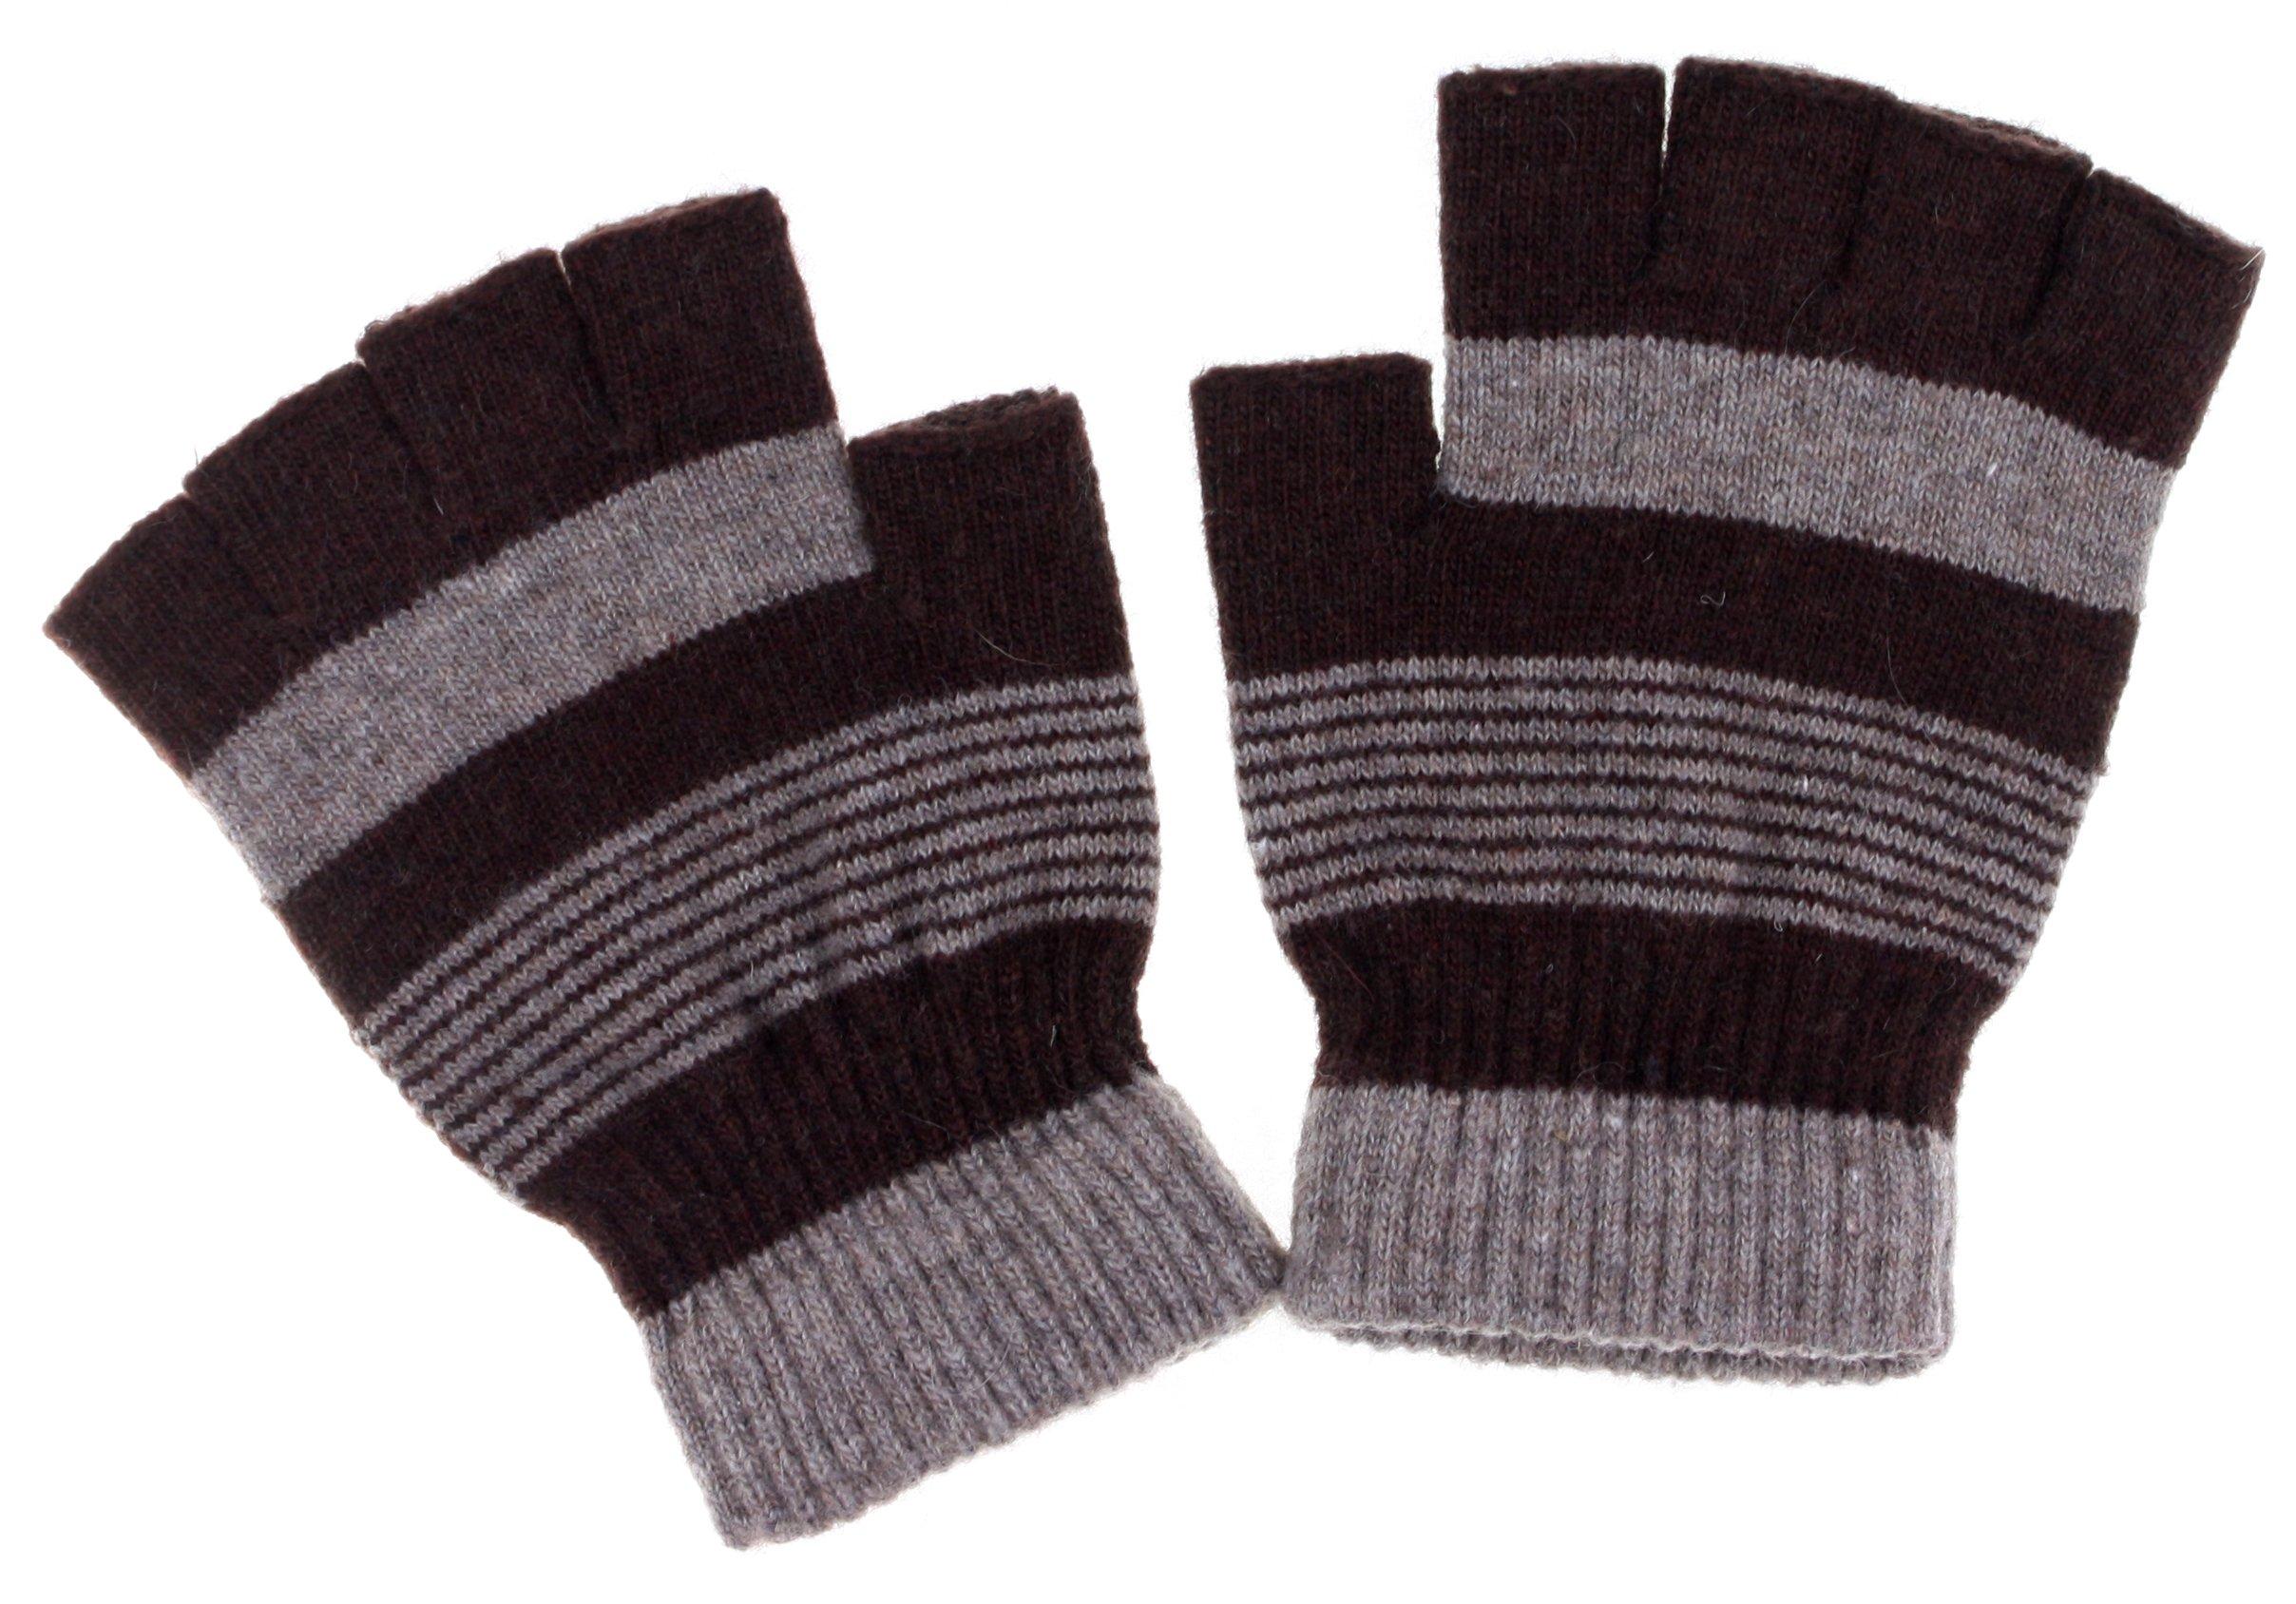 DRY77 Fingerless Casual Unisex Magic Wool Gloves, Brown